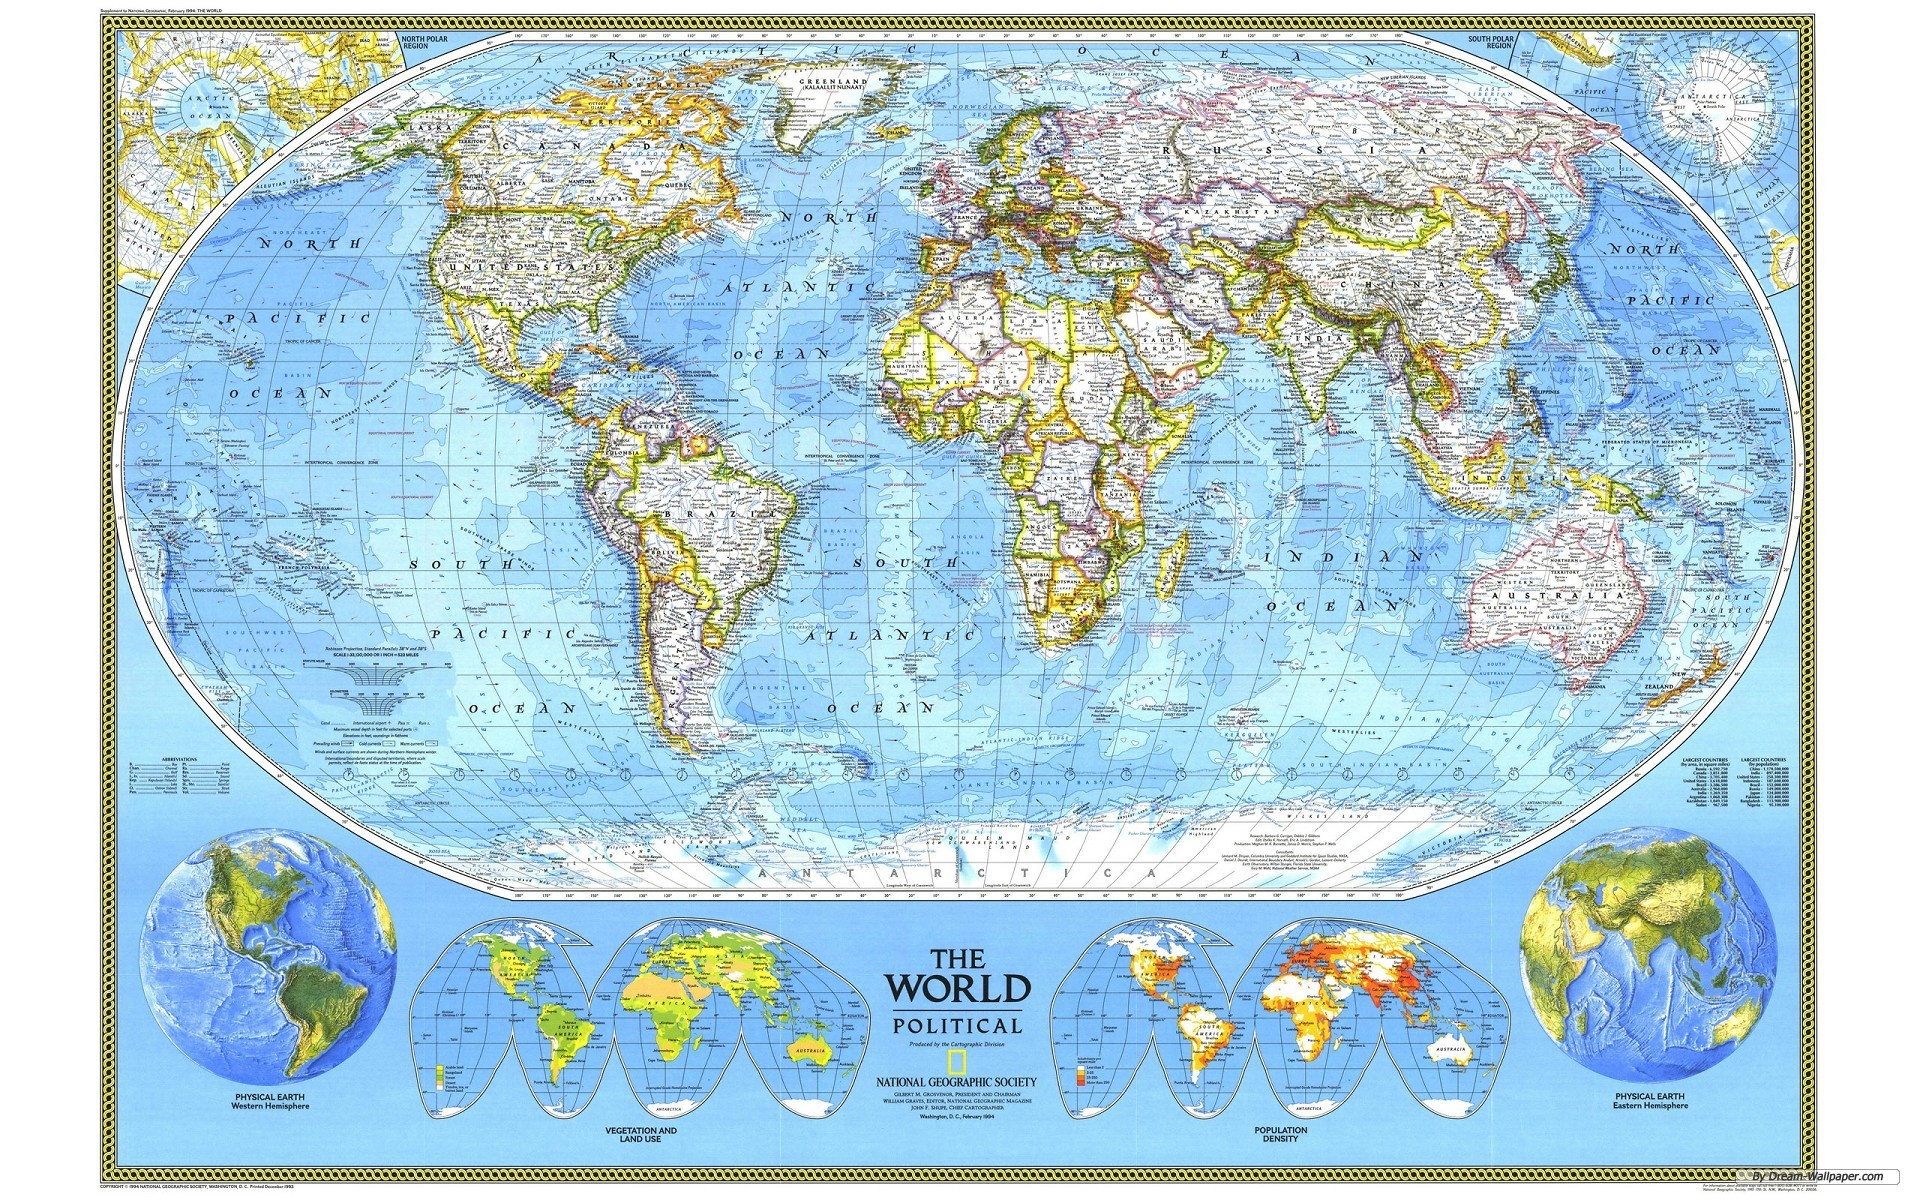 World map background download free stunning high resolution 1920x1200 wallpaper desktop wallpapers world travel 1920x1200 gumiabroncs Choice Image